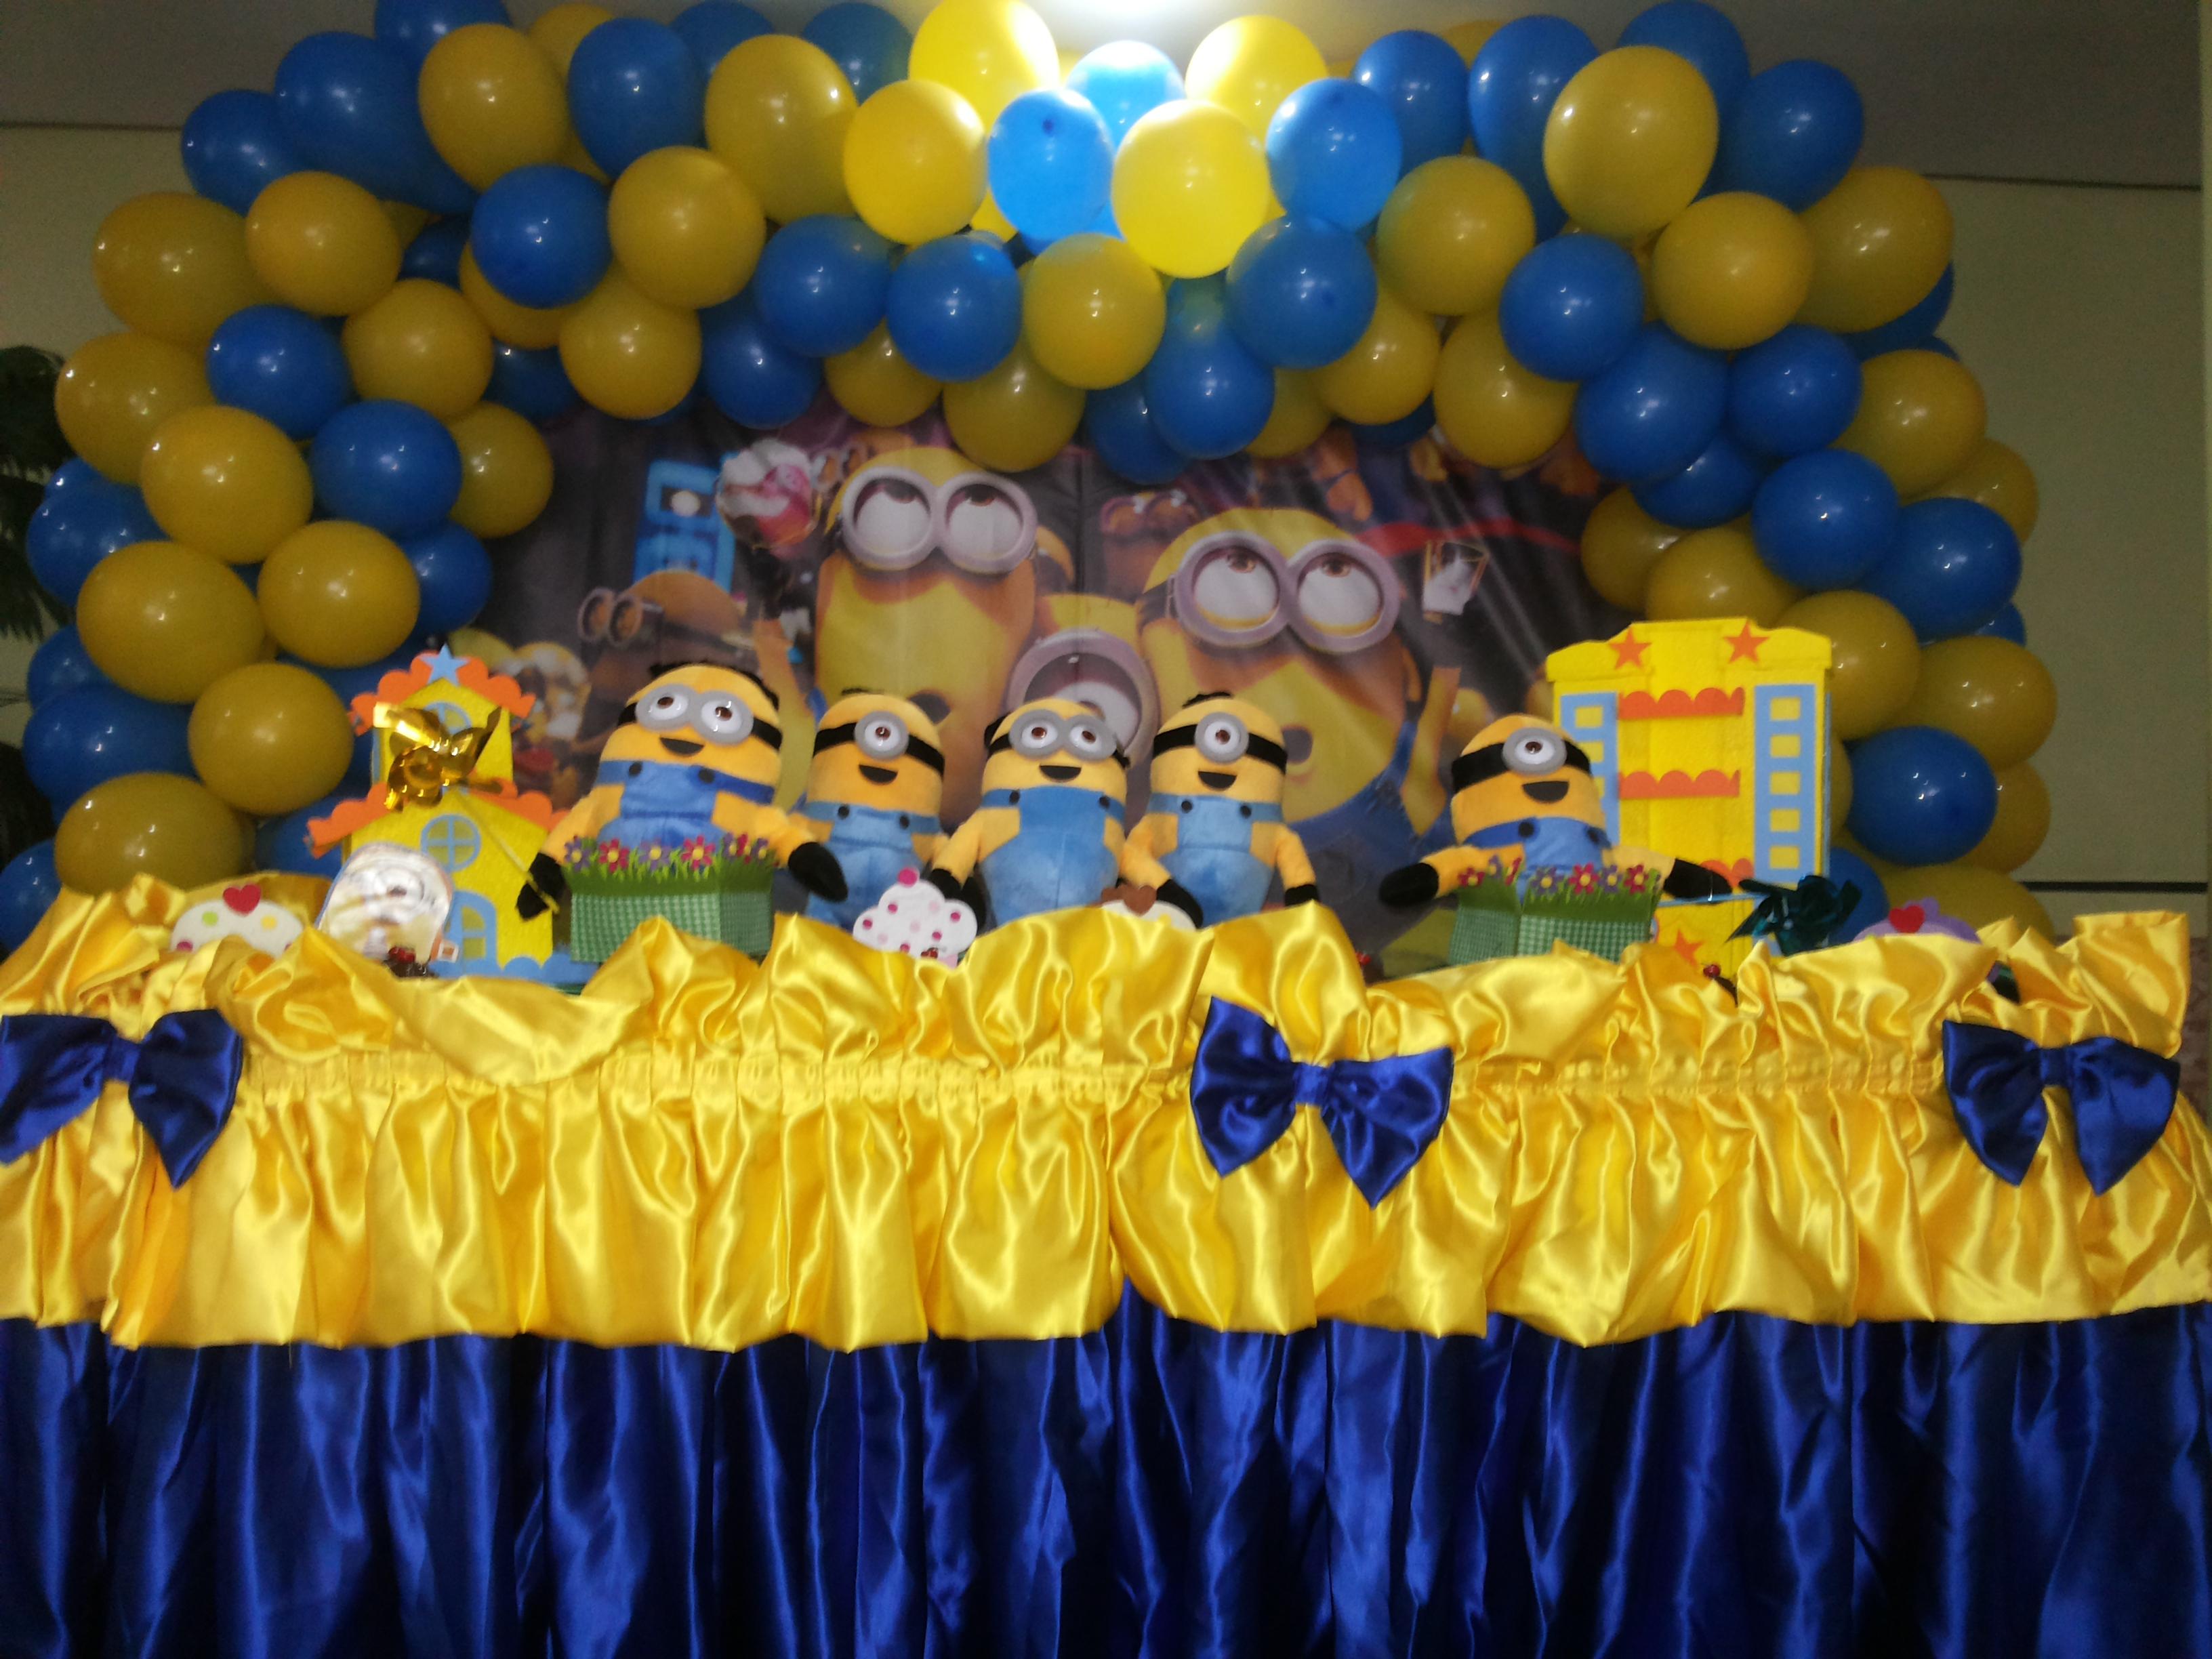 decoracao festa minions:decoracao-de-festa-minions-malvado-favorito decoracao-de-festa-minions